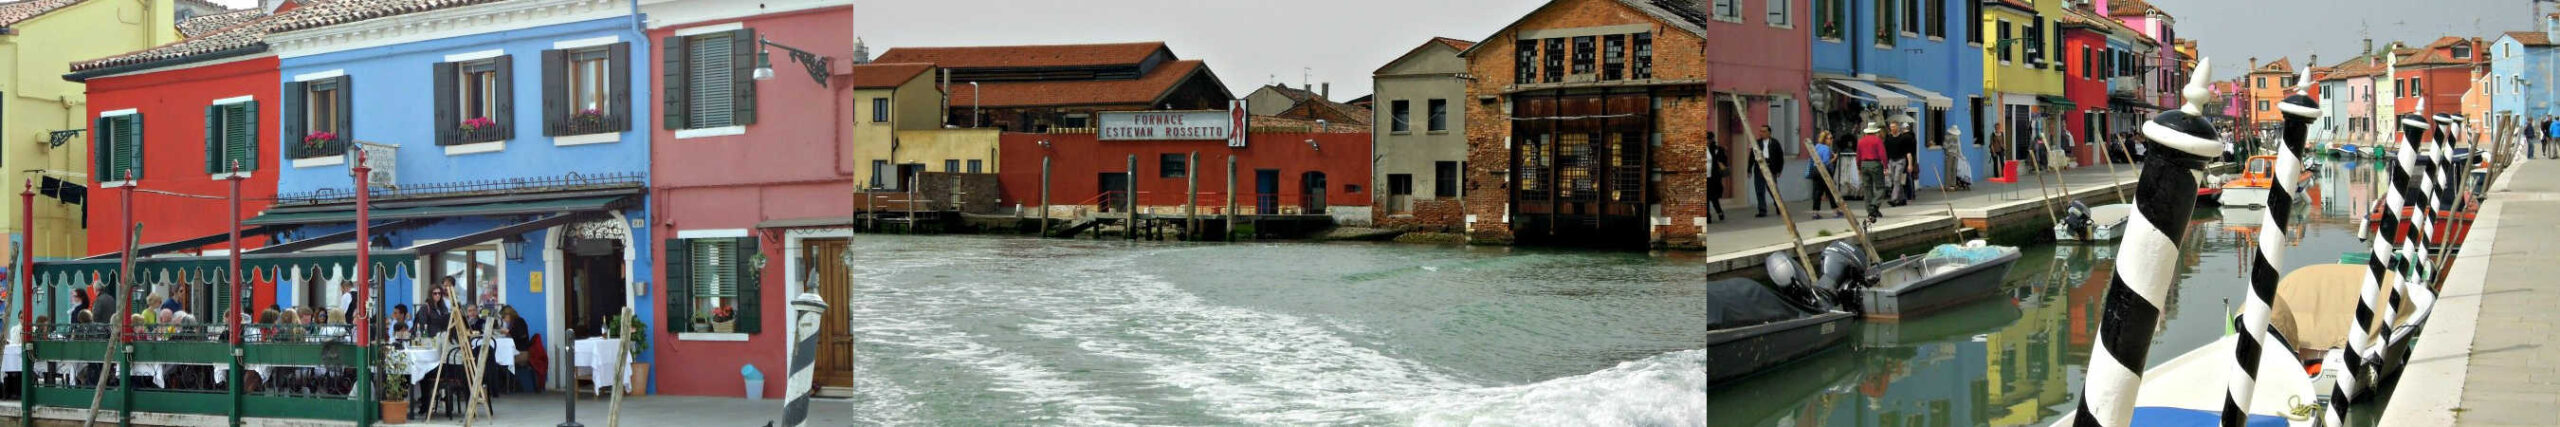 Murano Burano Photos